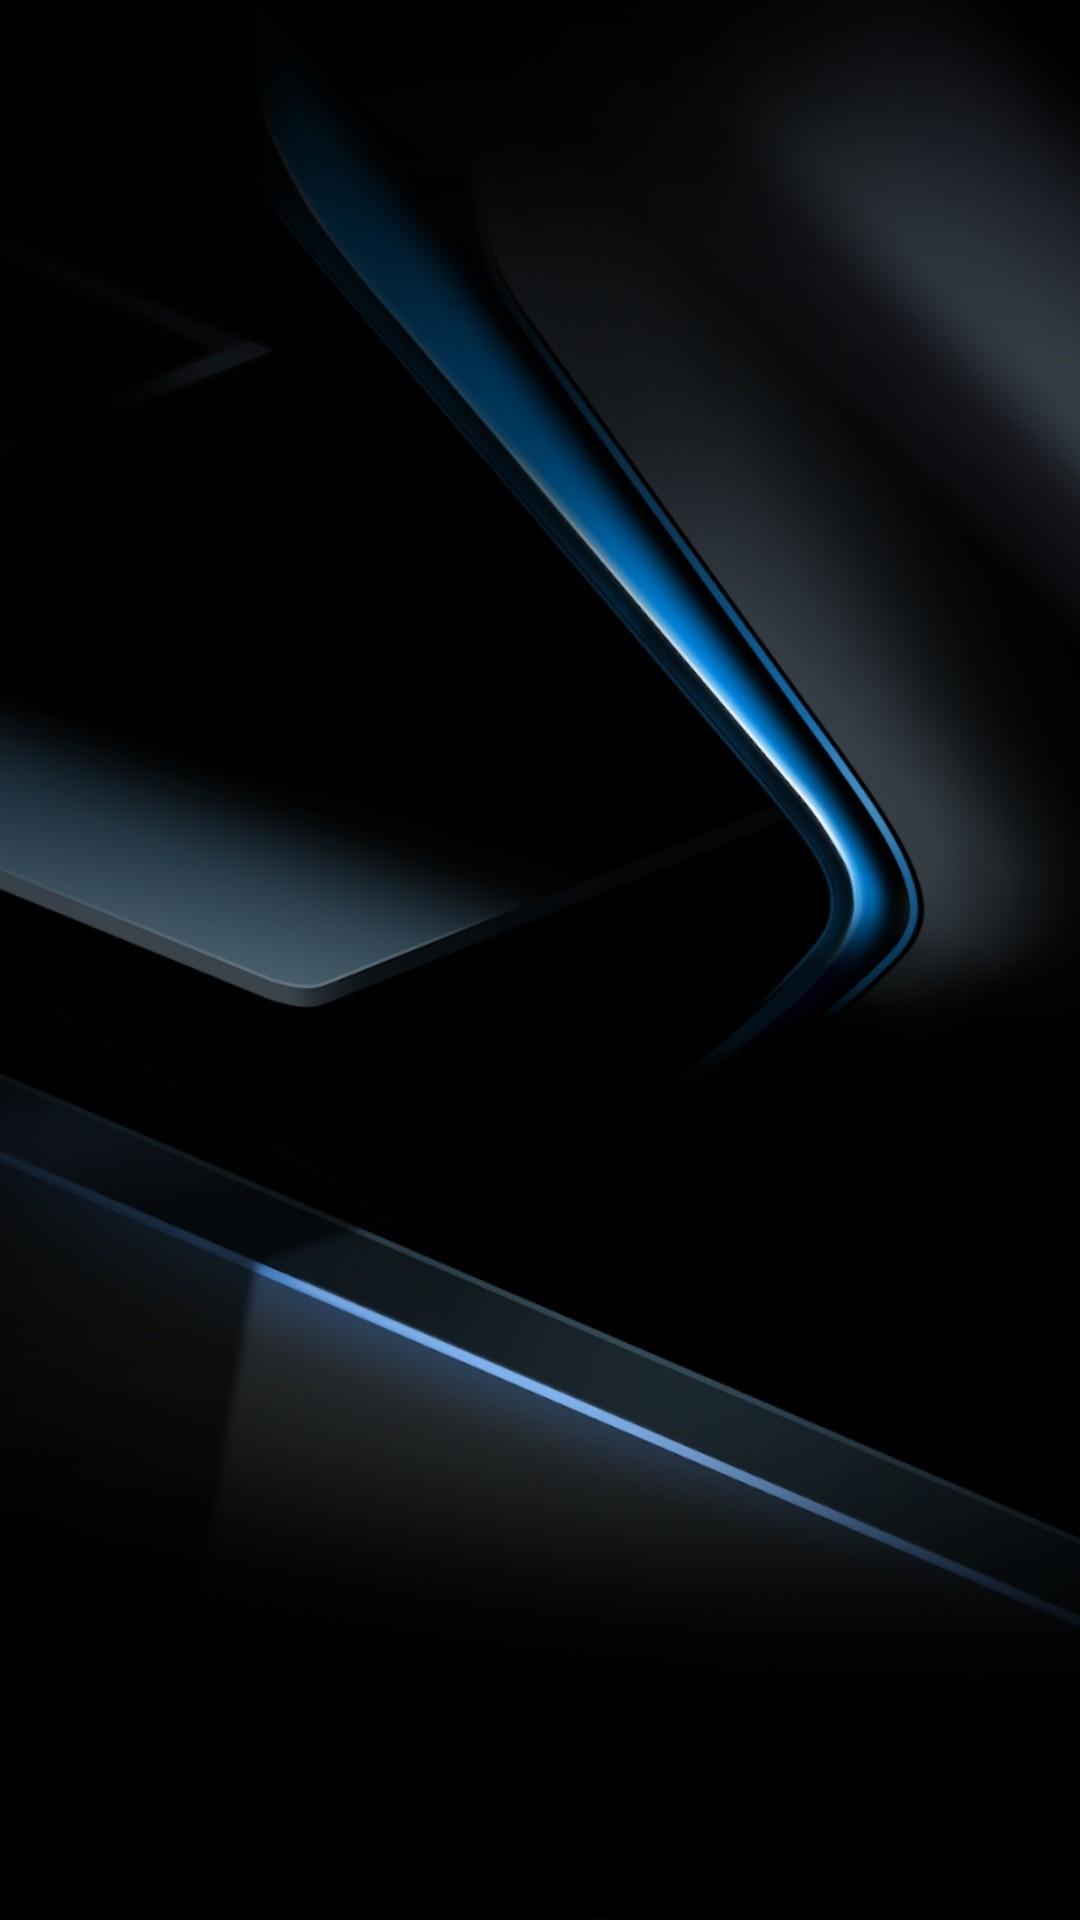 Black Blue Black And Blue Phone 1080x1920 Wallpaper Teahub Io